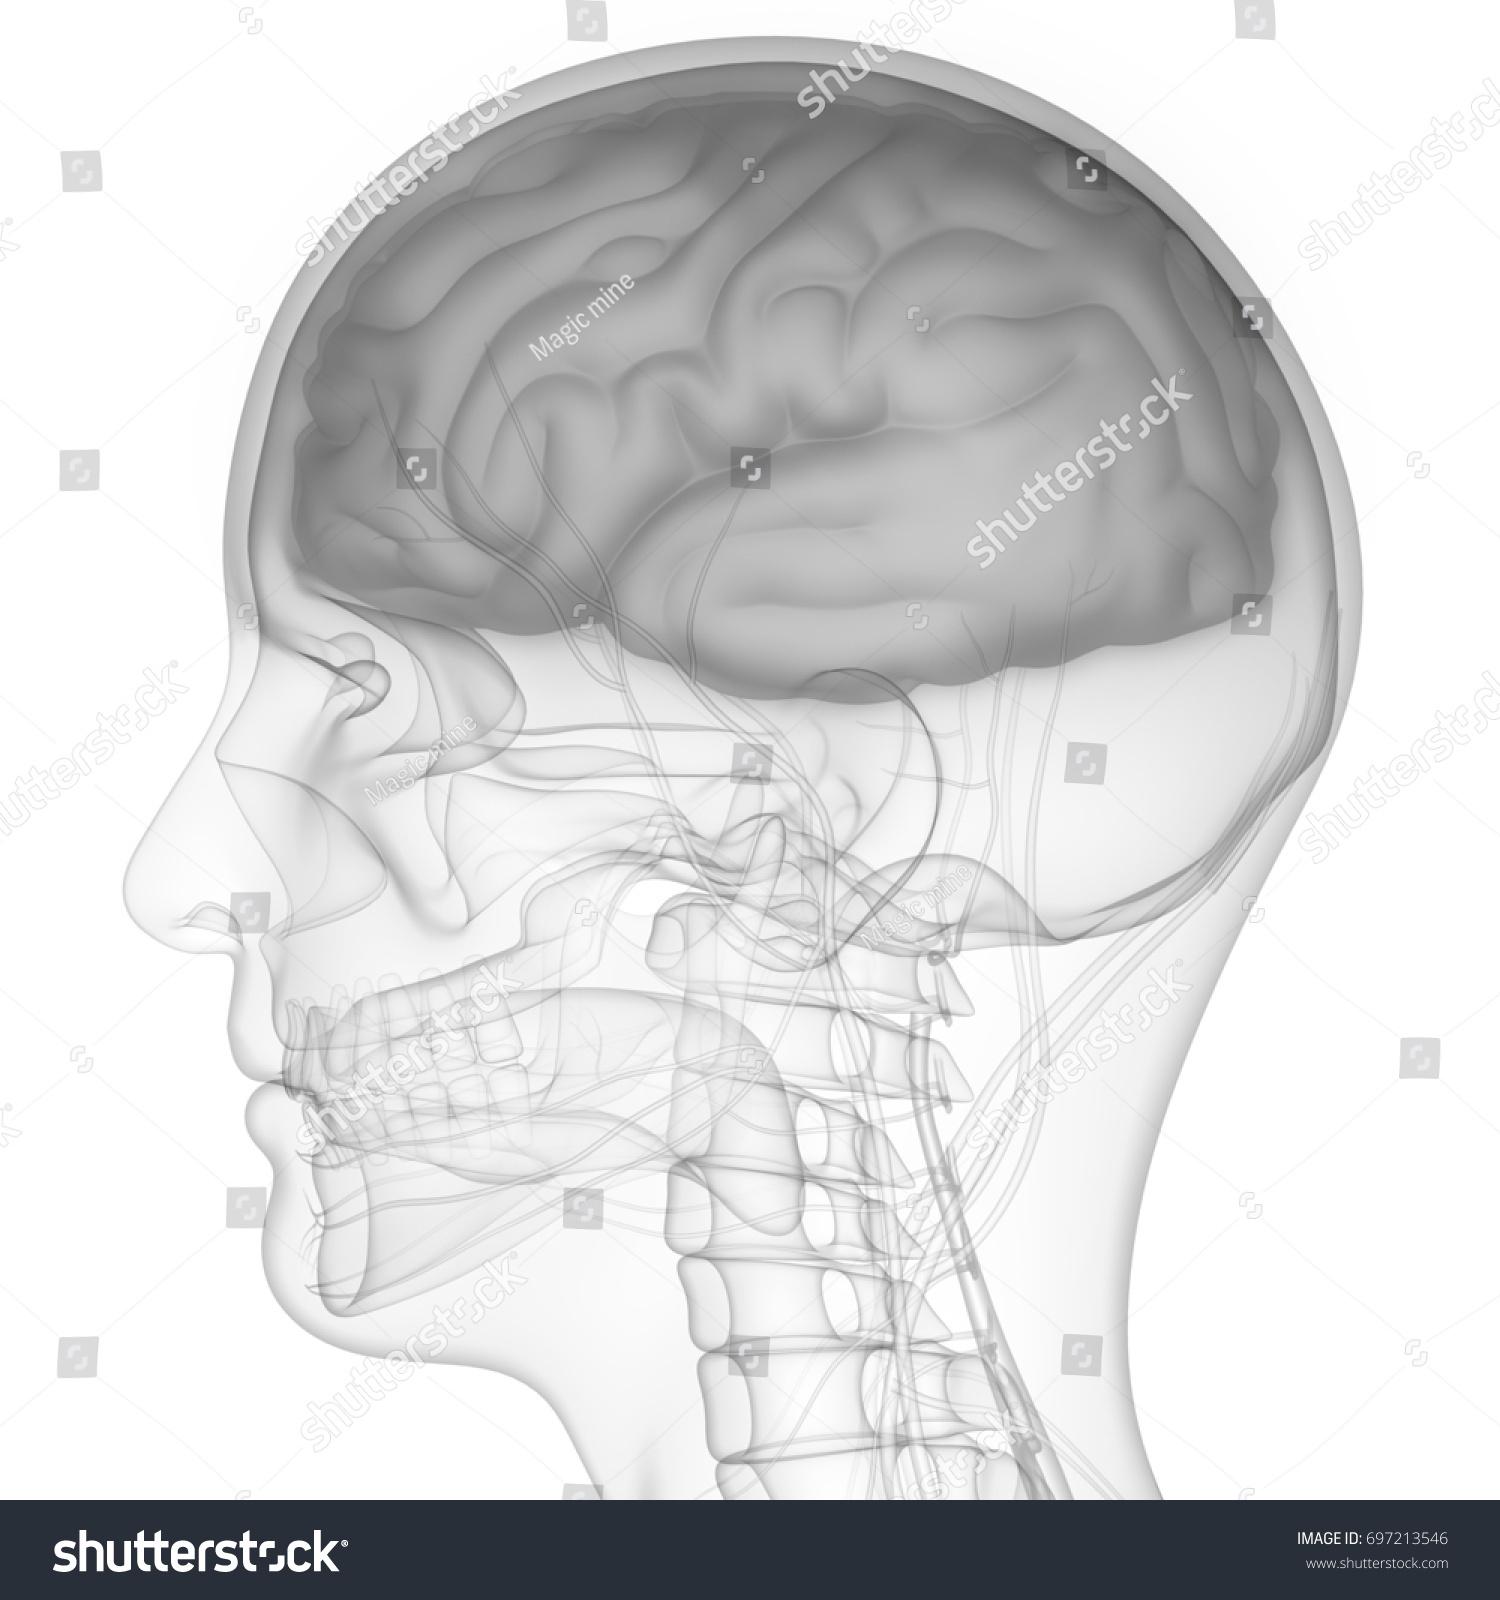 Human Brain Nervous System Anatomy 3 D Stock Illustration 697213546 ...